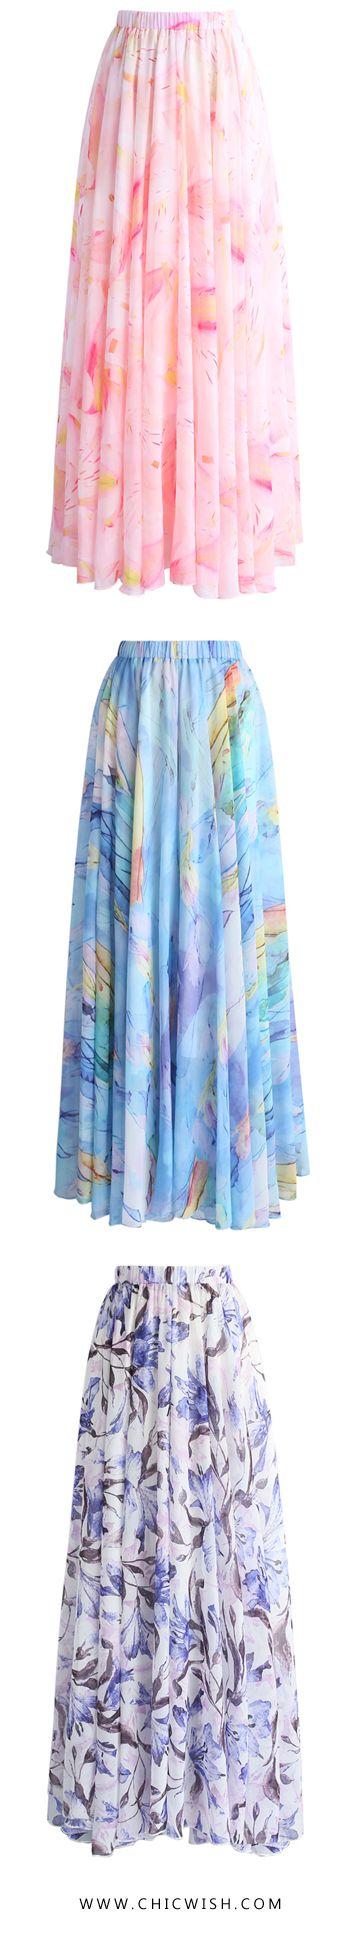 43% OFF Limited Time Sale! New Chiffon Maxi Skirts